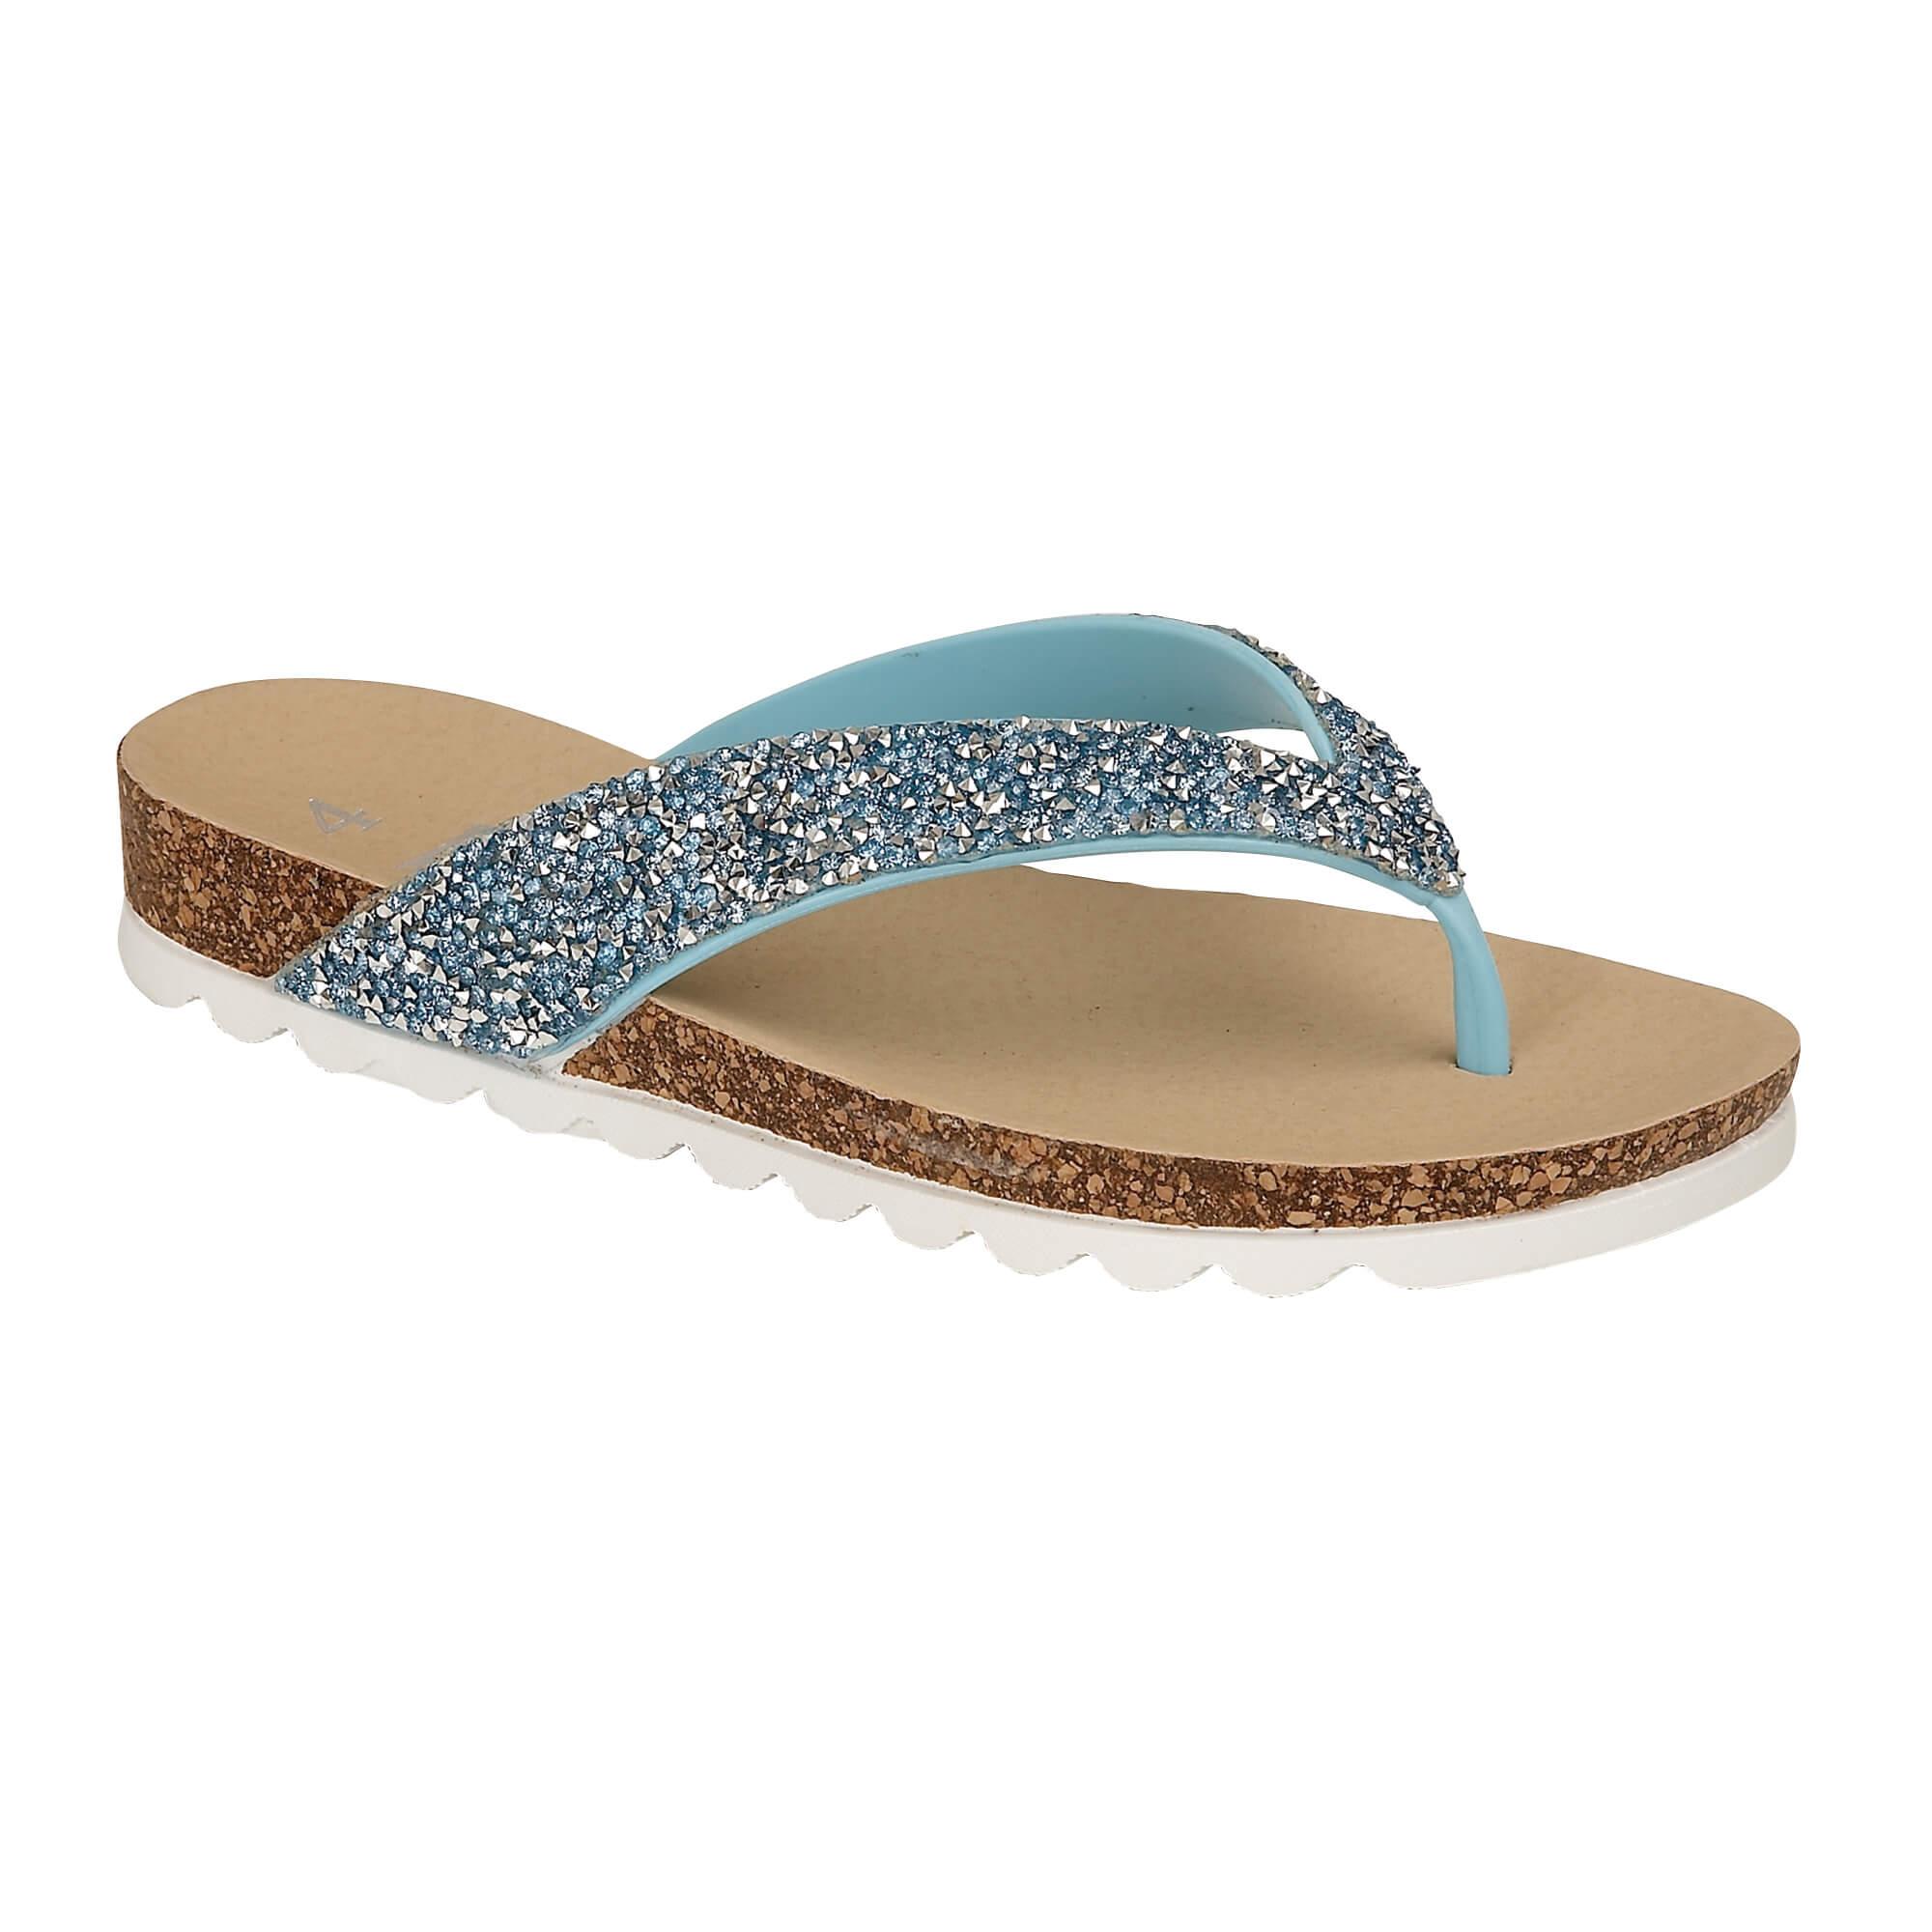 cba371e67d48 Womens Diamante Glitter Summer Sandals Jewel Toe Post Mules Comfort ...